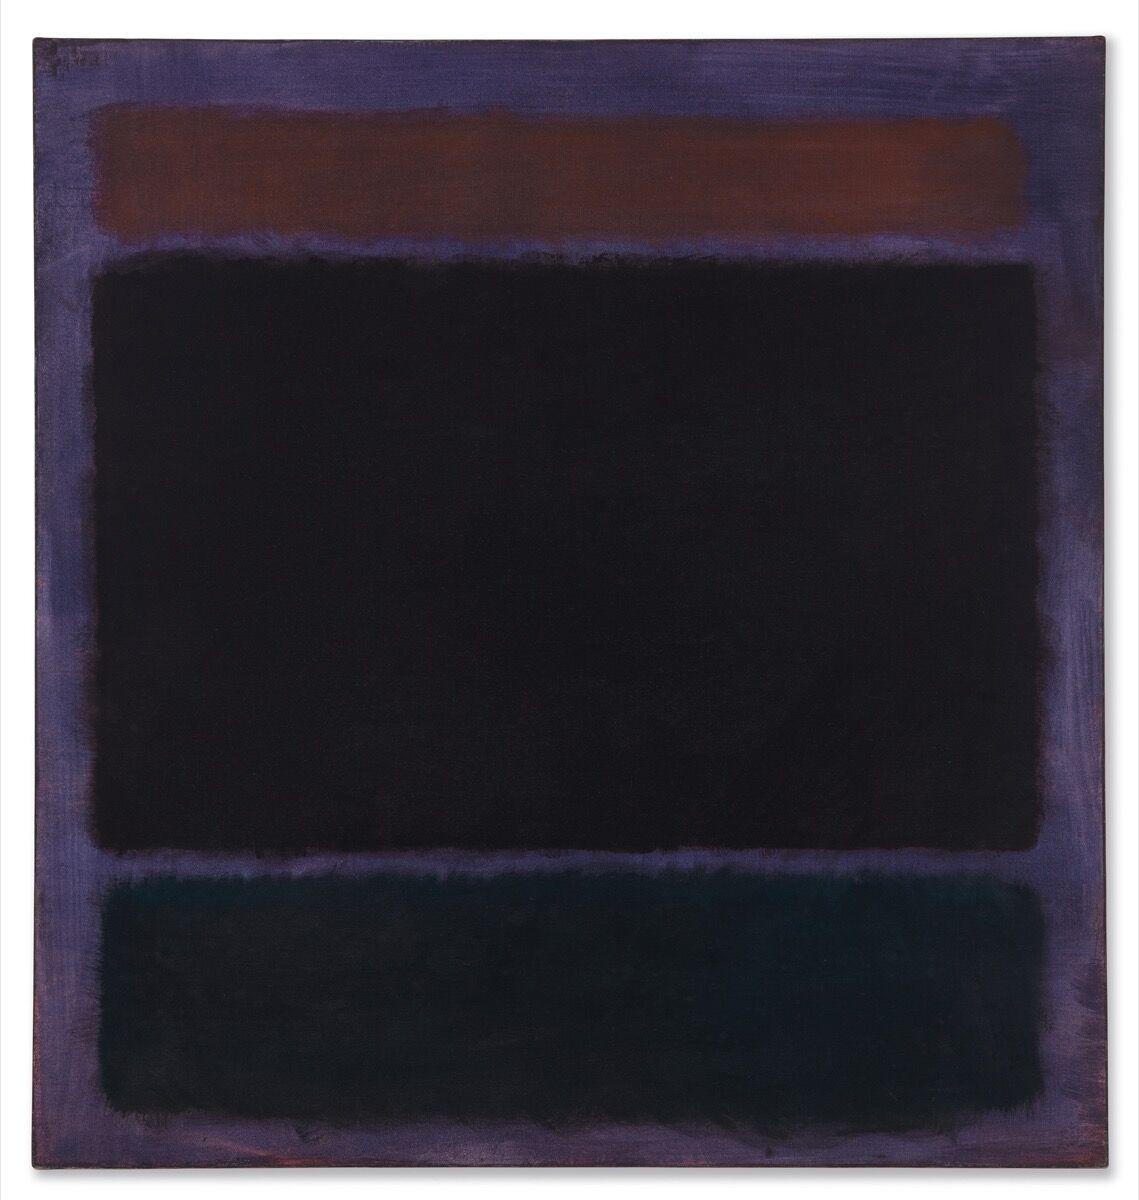 Mark Rothko, Untitled (Rust, Blacks on Plum), 1962. Courtesy of Christie's.